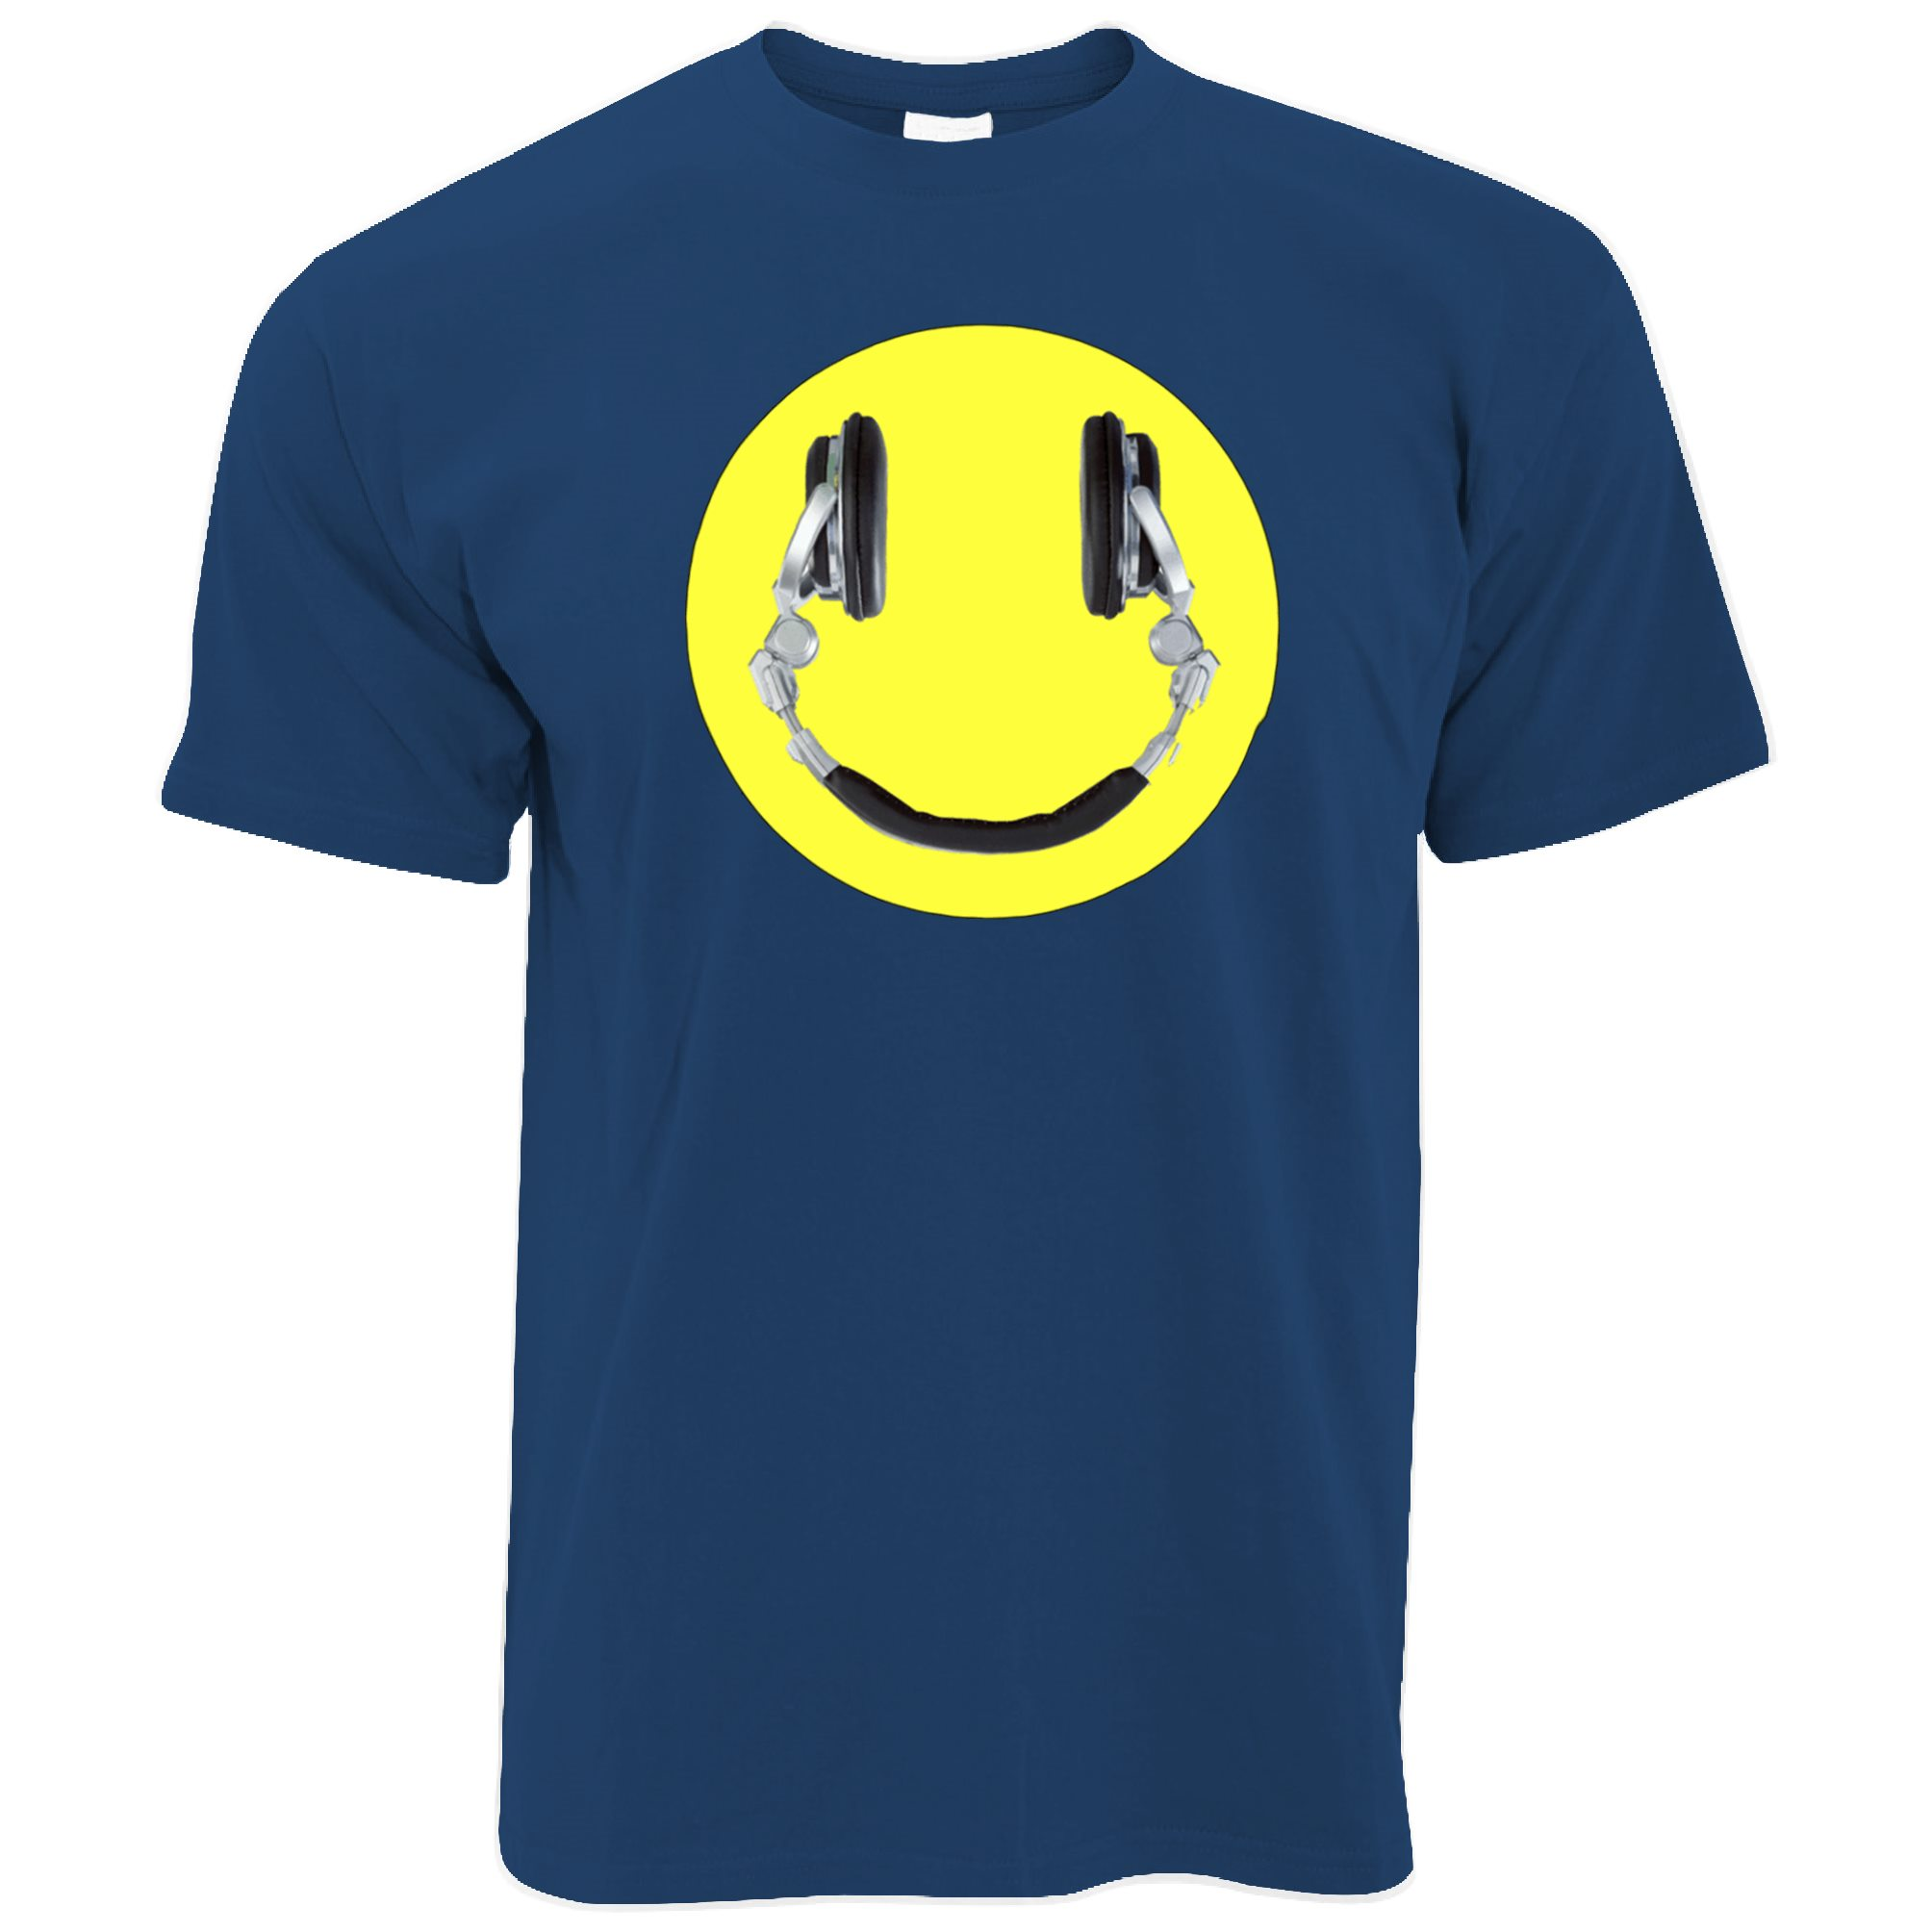 Acid Dripping Smiley Face Tie Dye House Rave Music Men Women Unisex T-shirt 909